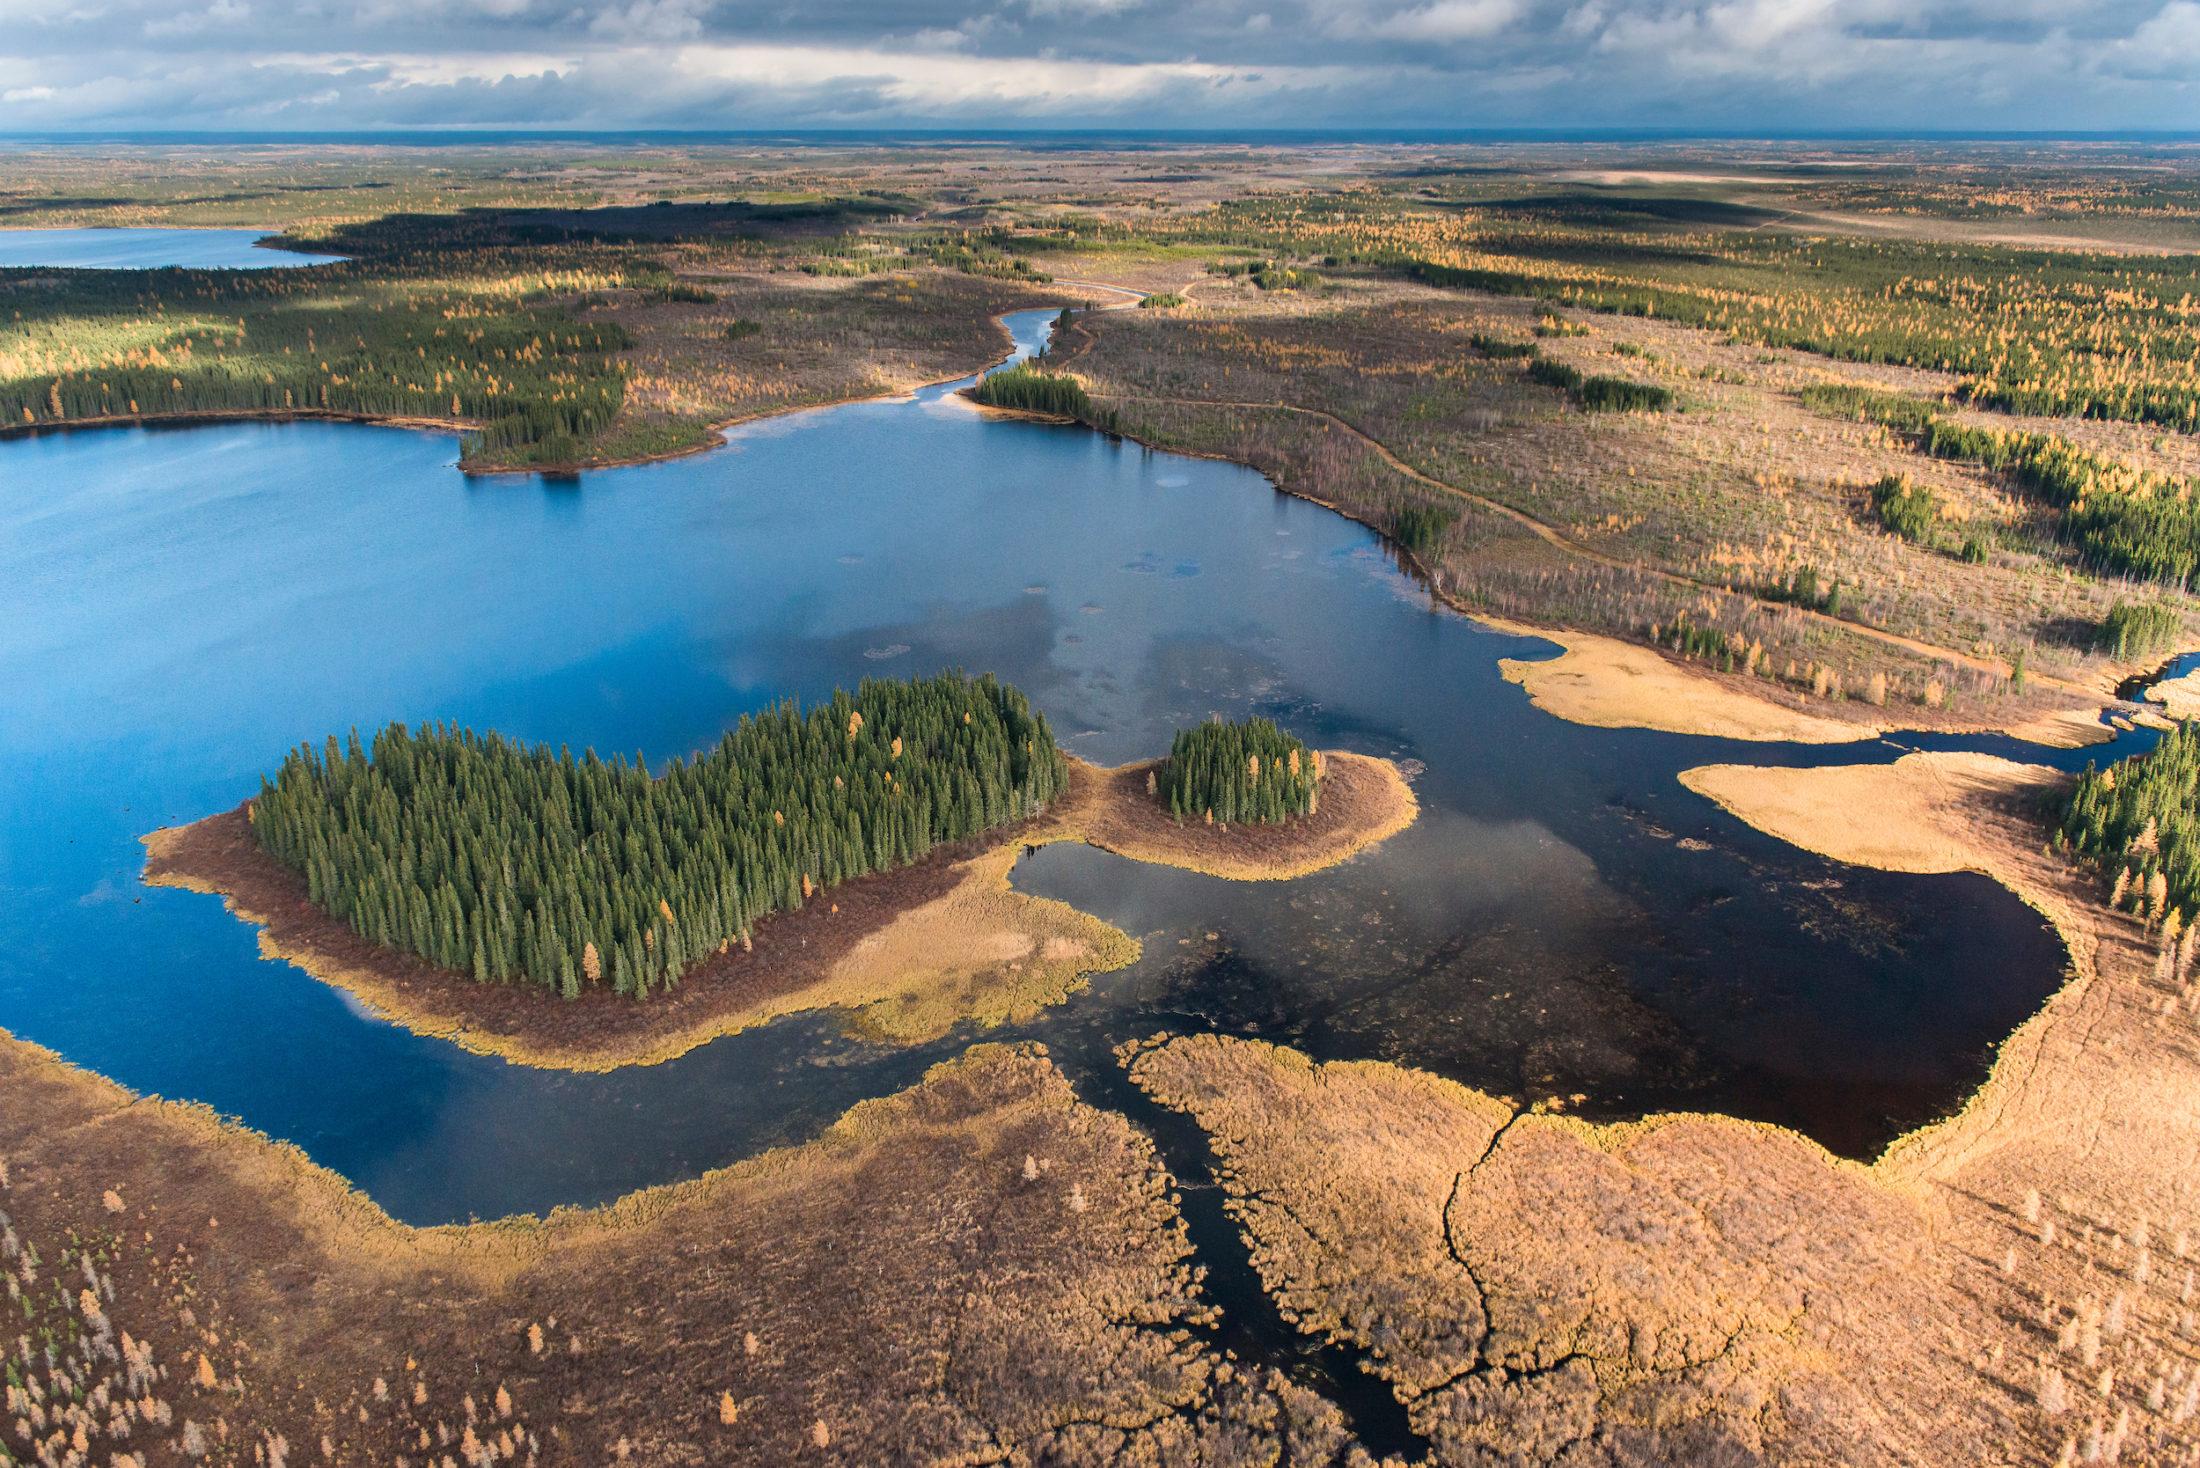 James Bay Lowlands